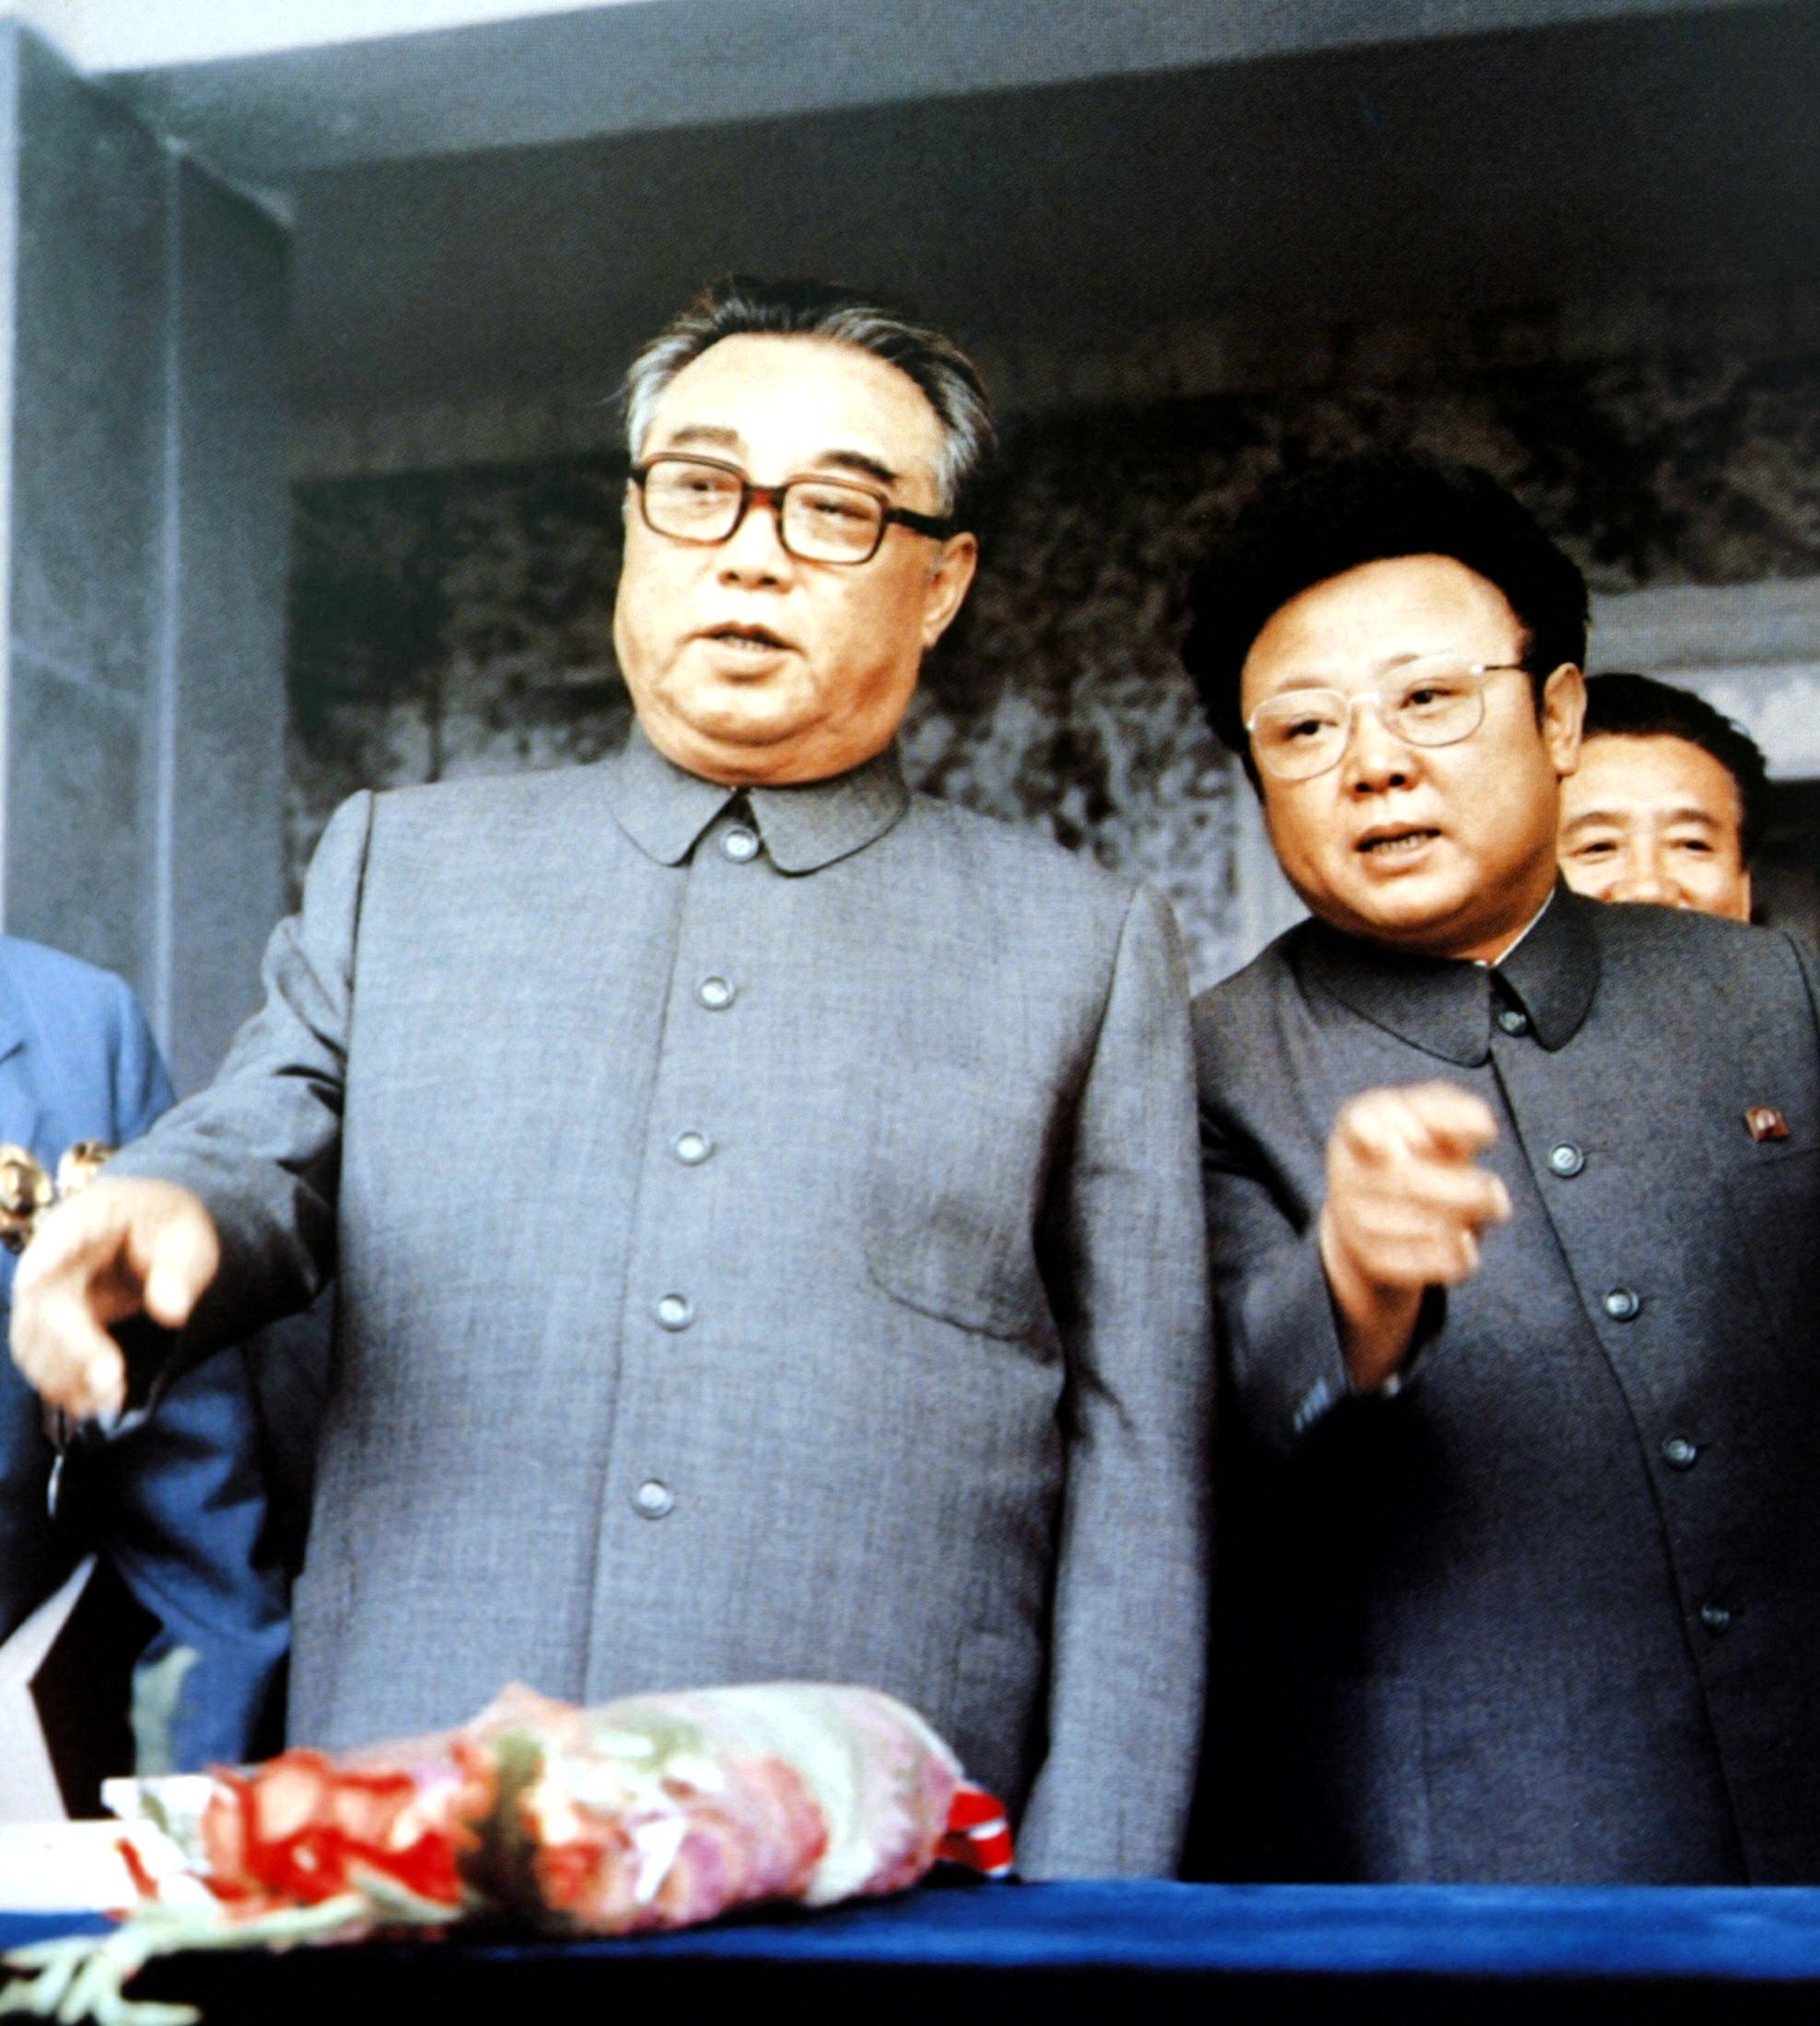 Kim il sung founder of north korea chats with his son kim jong il at kim ii sung communist north korea korean war kim jong ii thecheapjerseys Choice Image